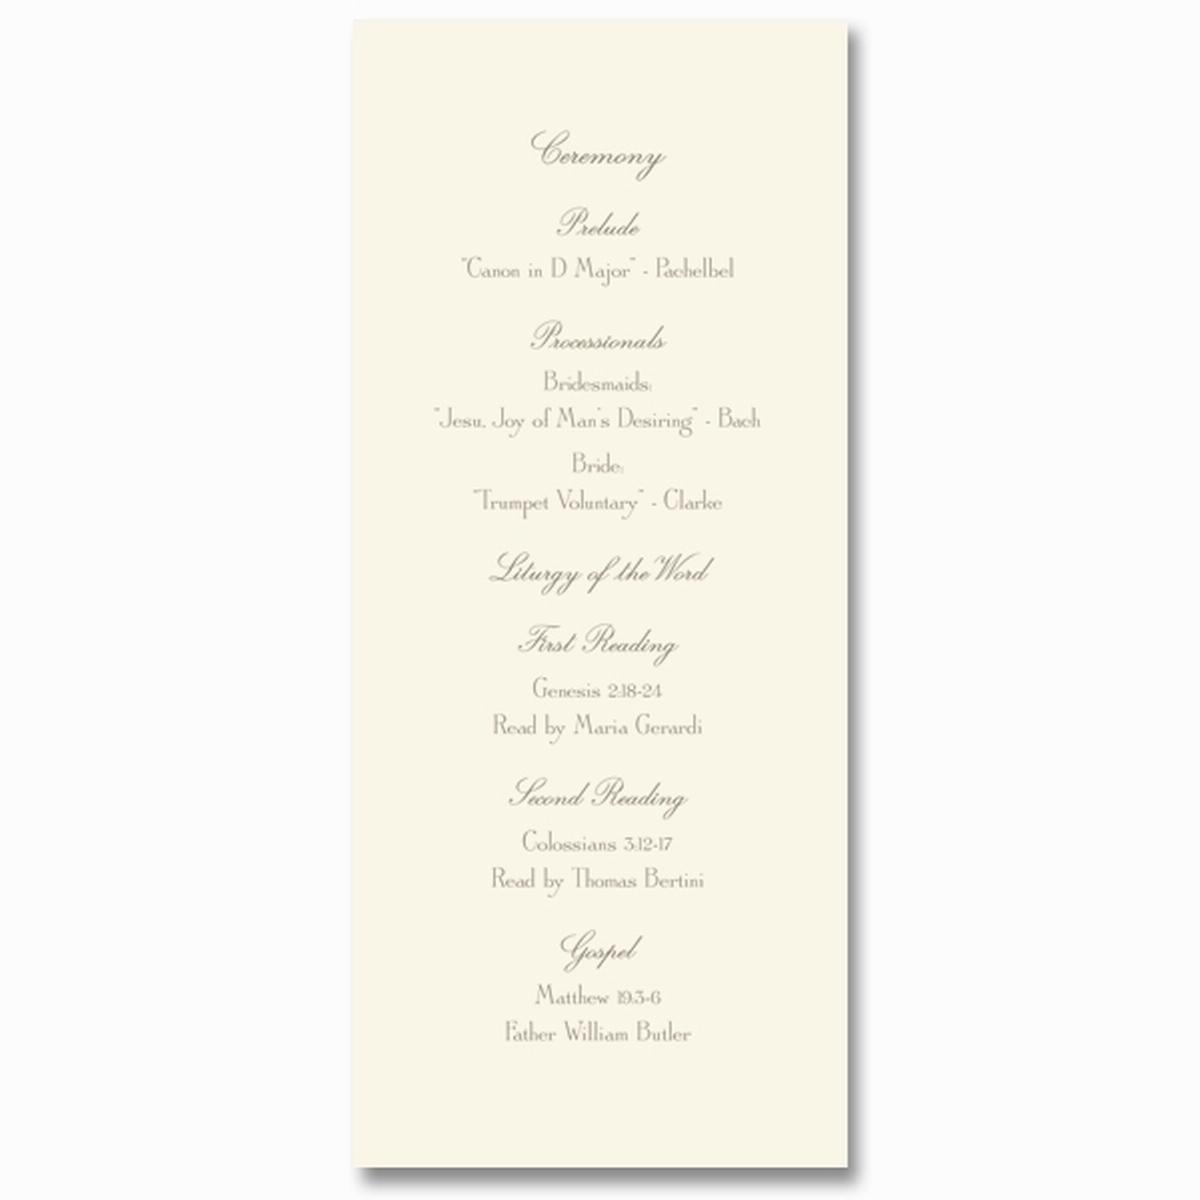 letterpress wedding invitations perth wa - 28 images - letterpress ...